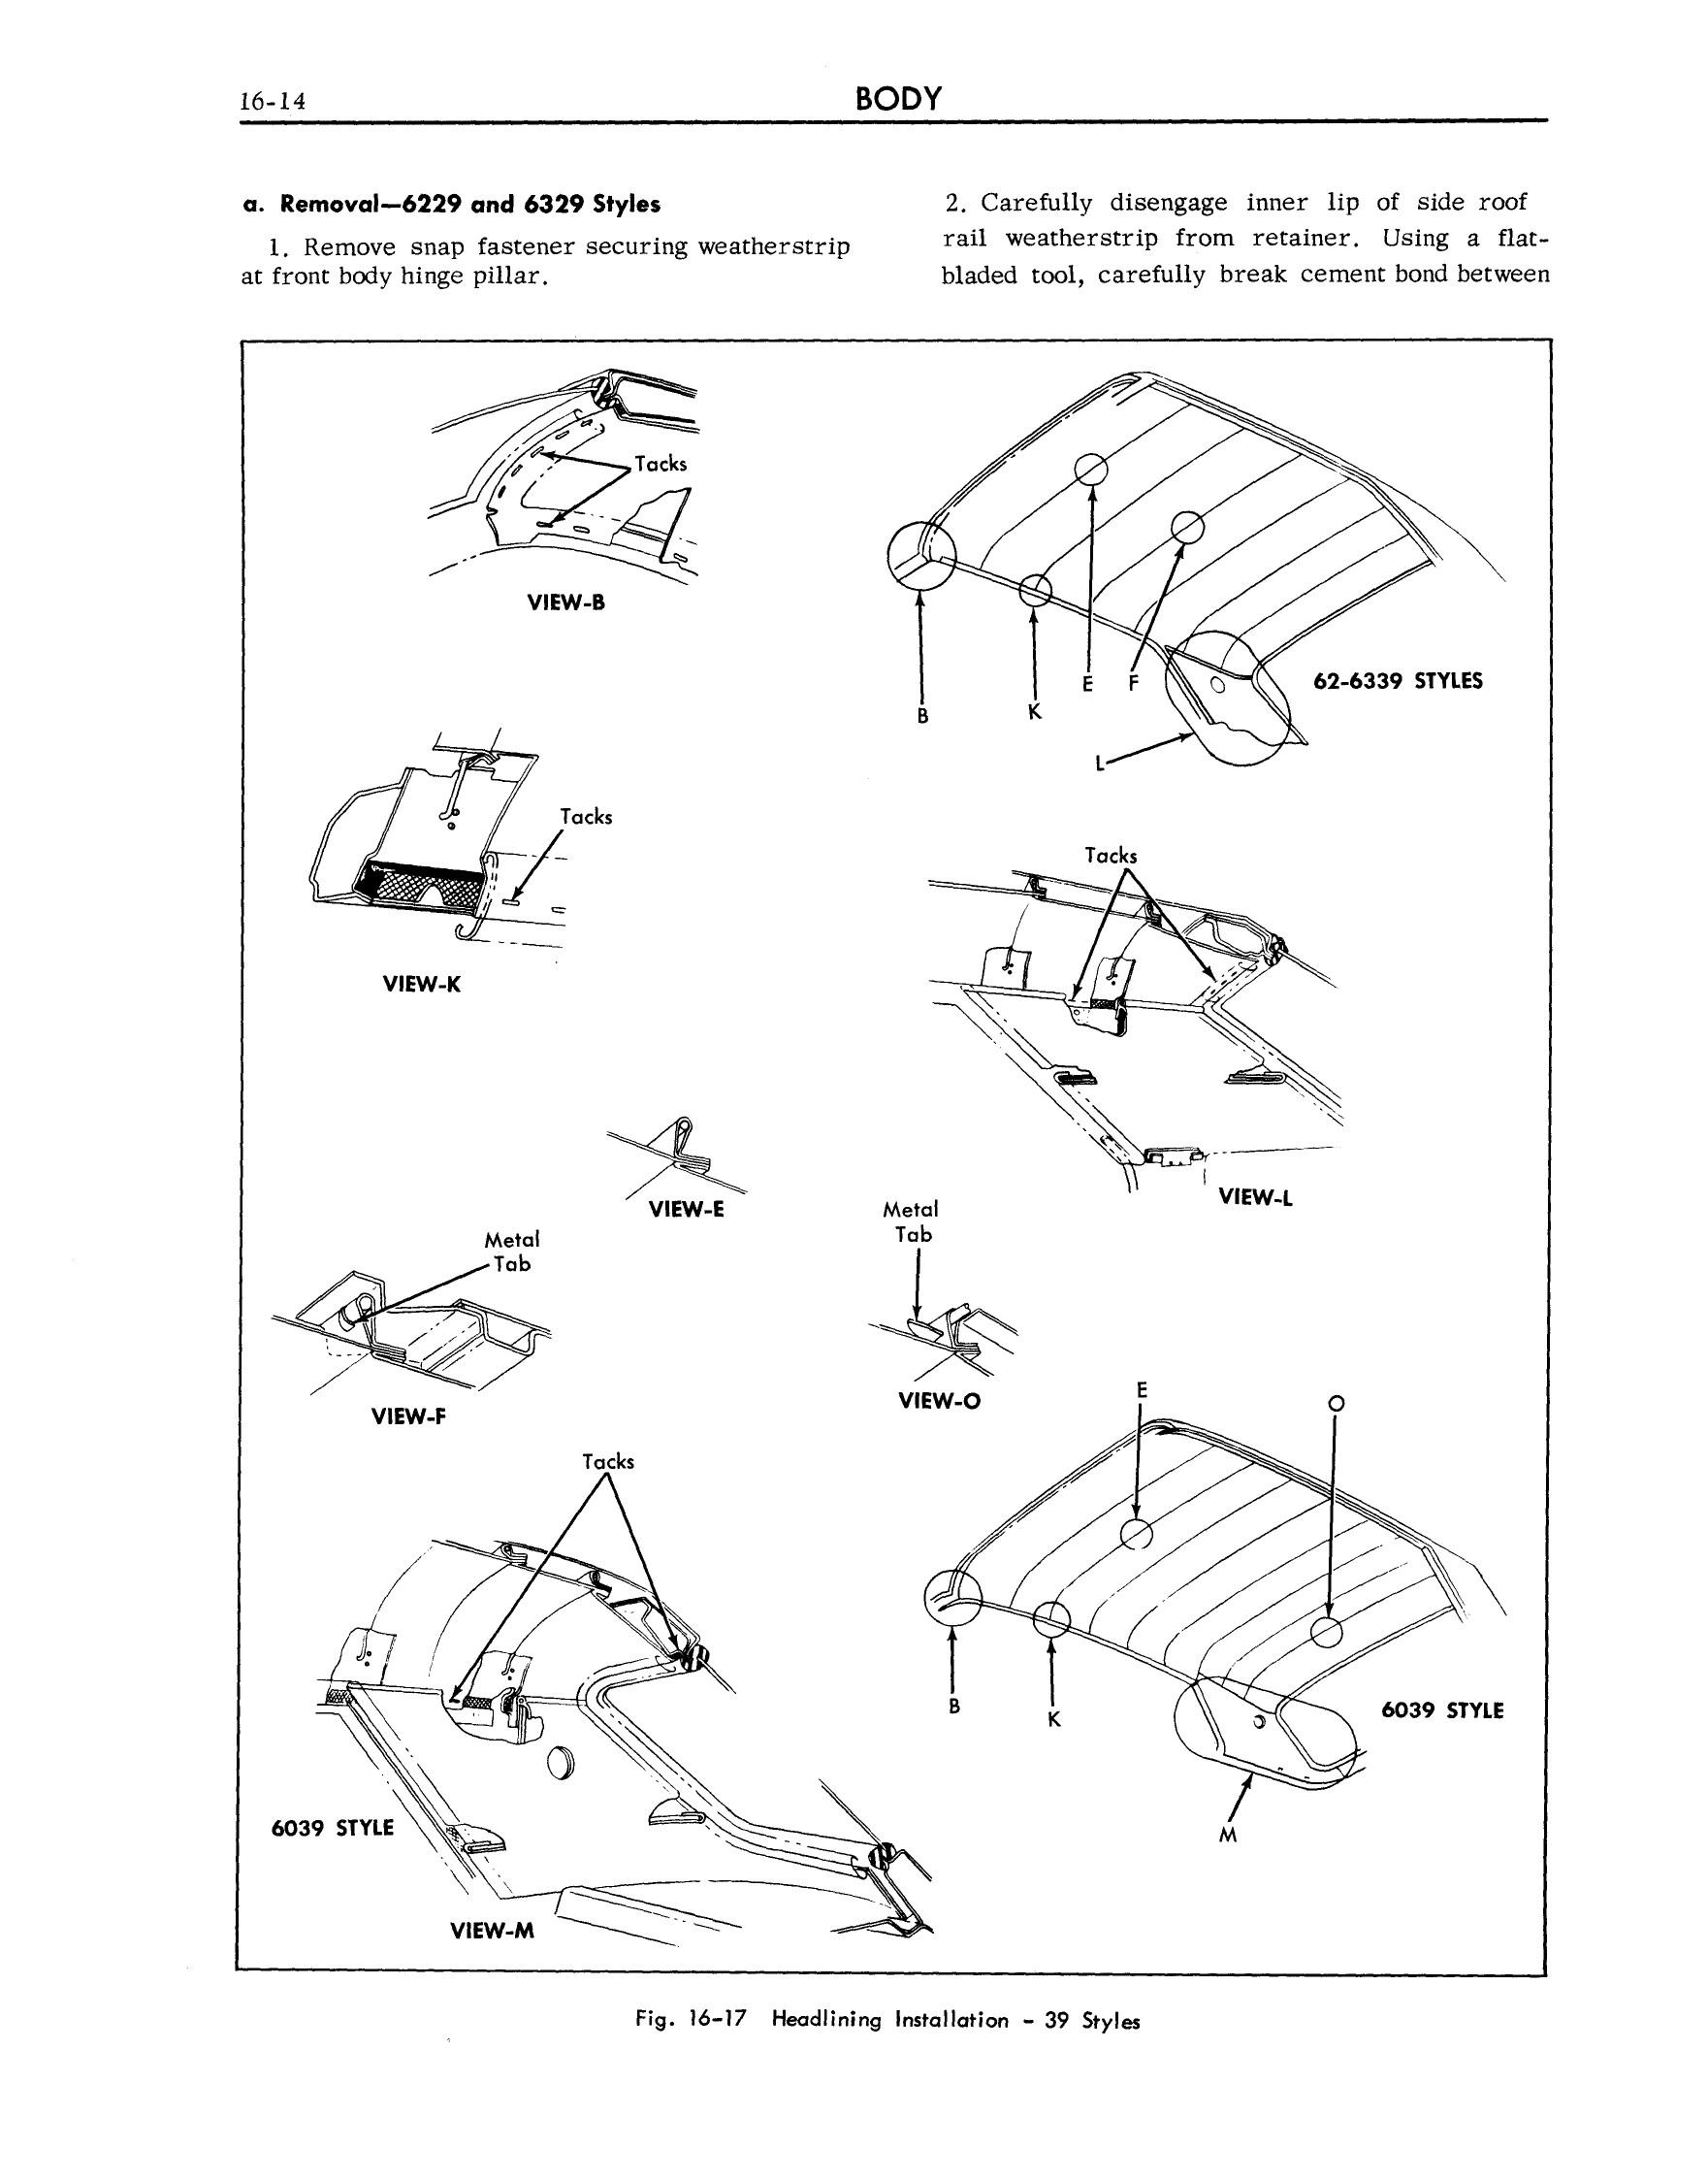 1963 Cadillac Shop Manual- Body Page 14 of 124